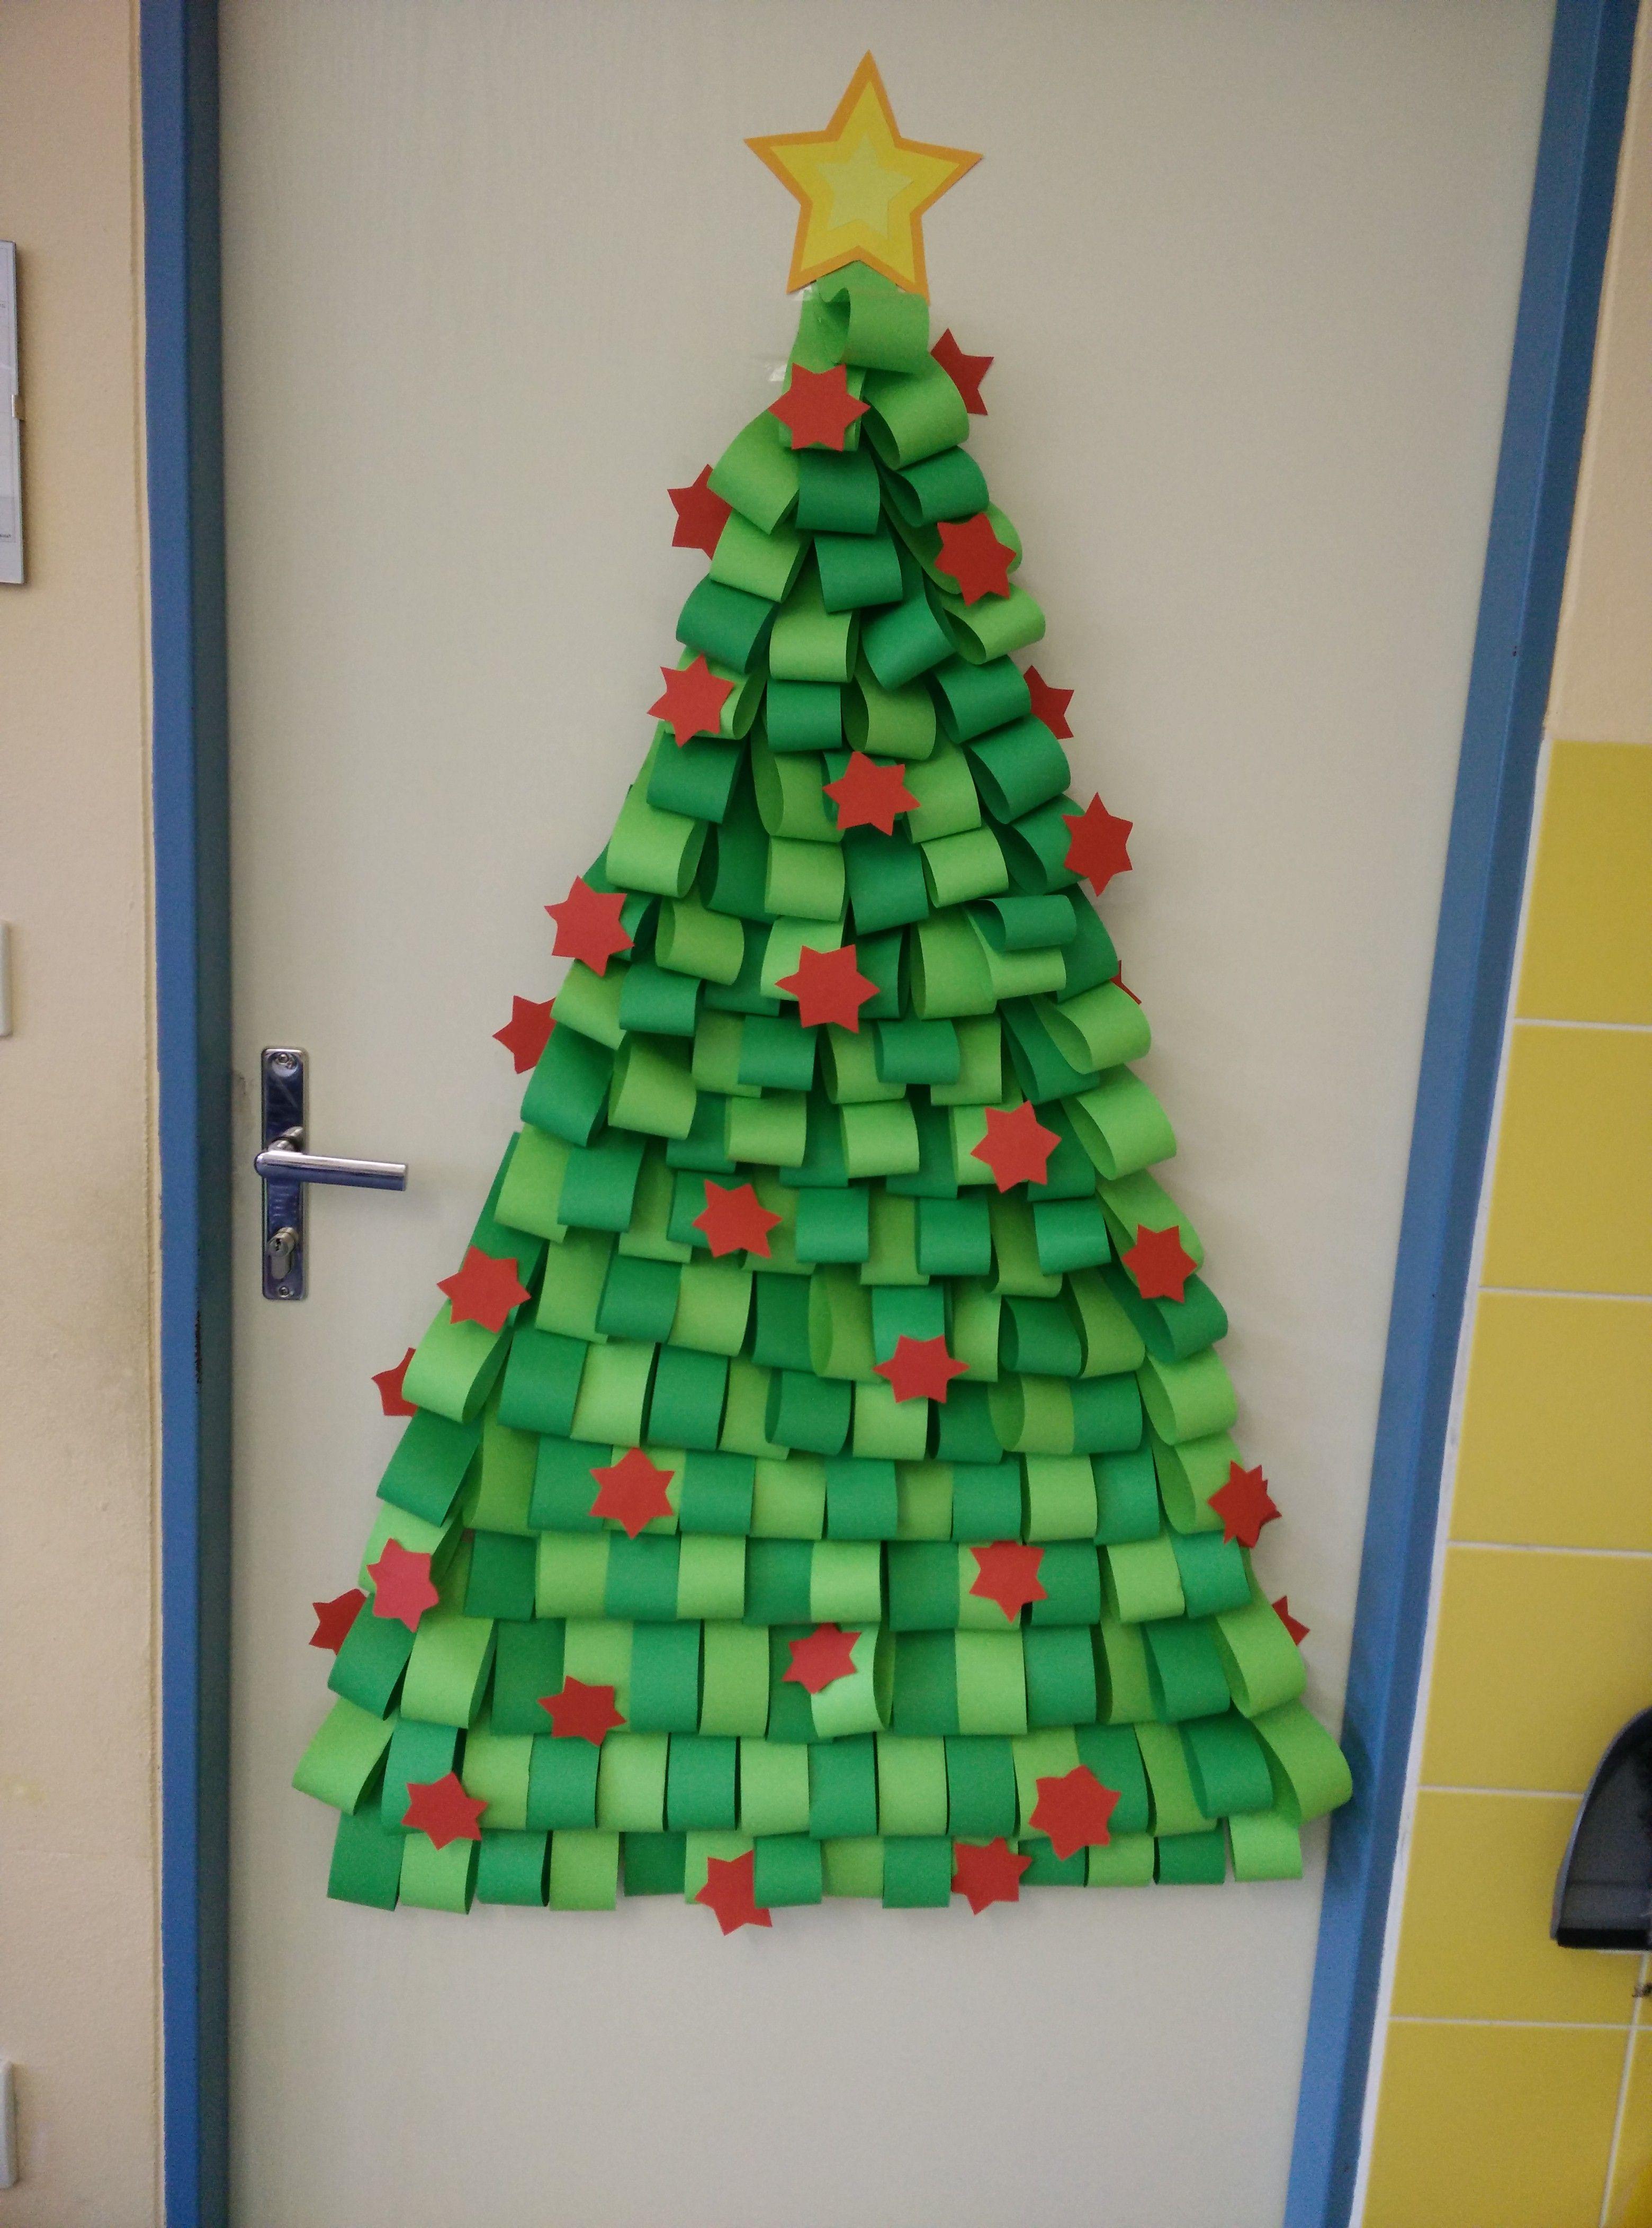 Pin de carmen arg ello en nadal decoracion navidad for Decoracion puerta aula infantil